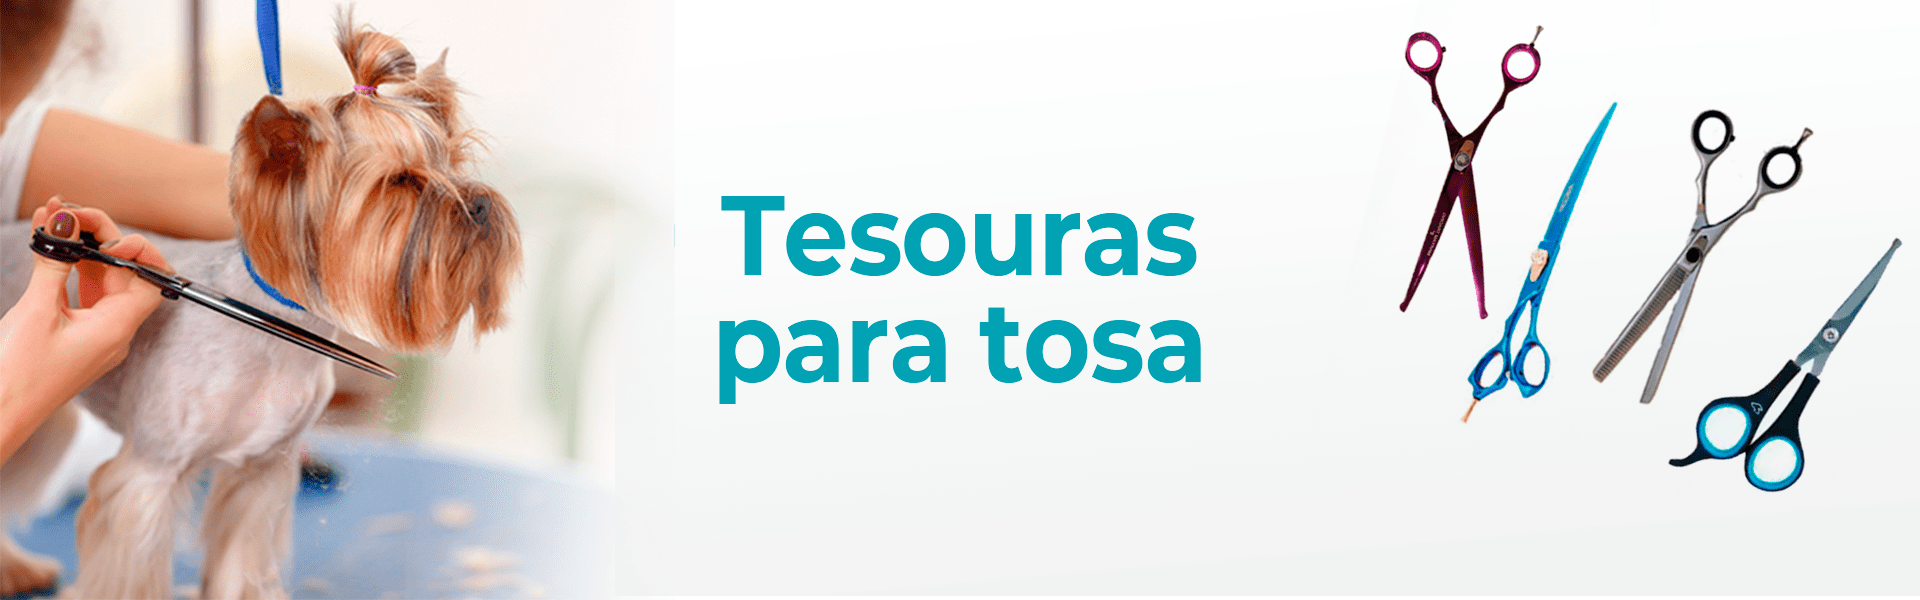 Tesouras - categoria @Desktop